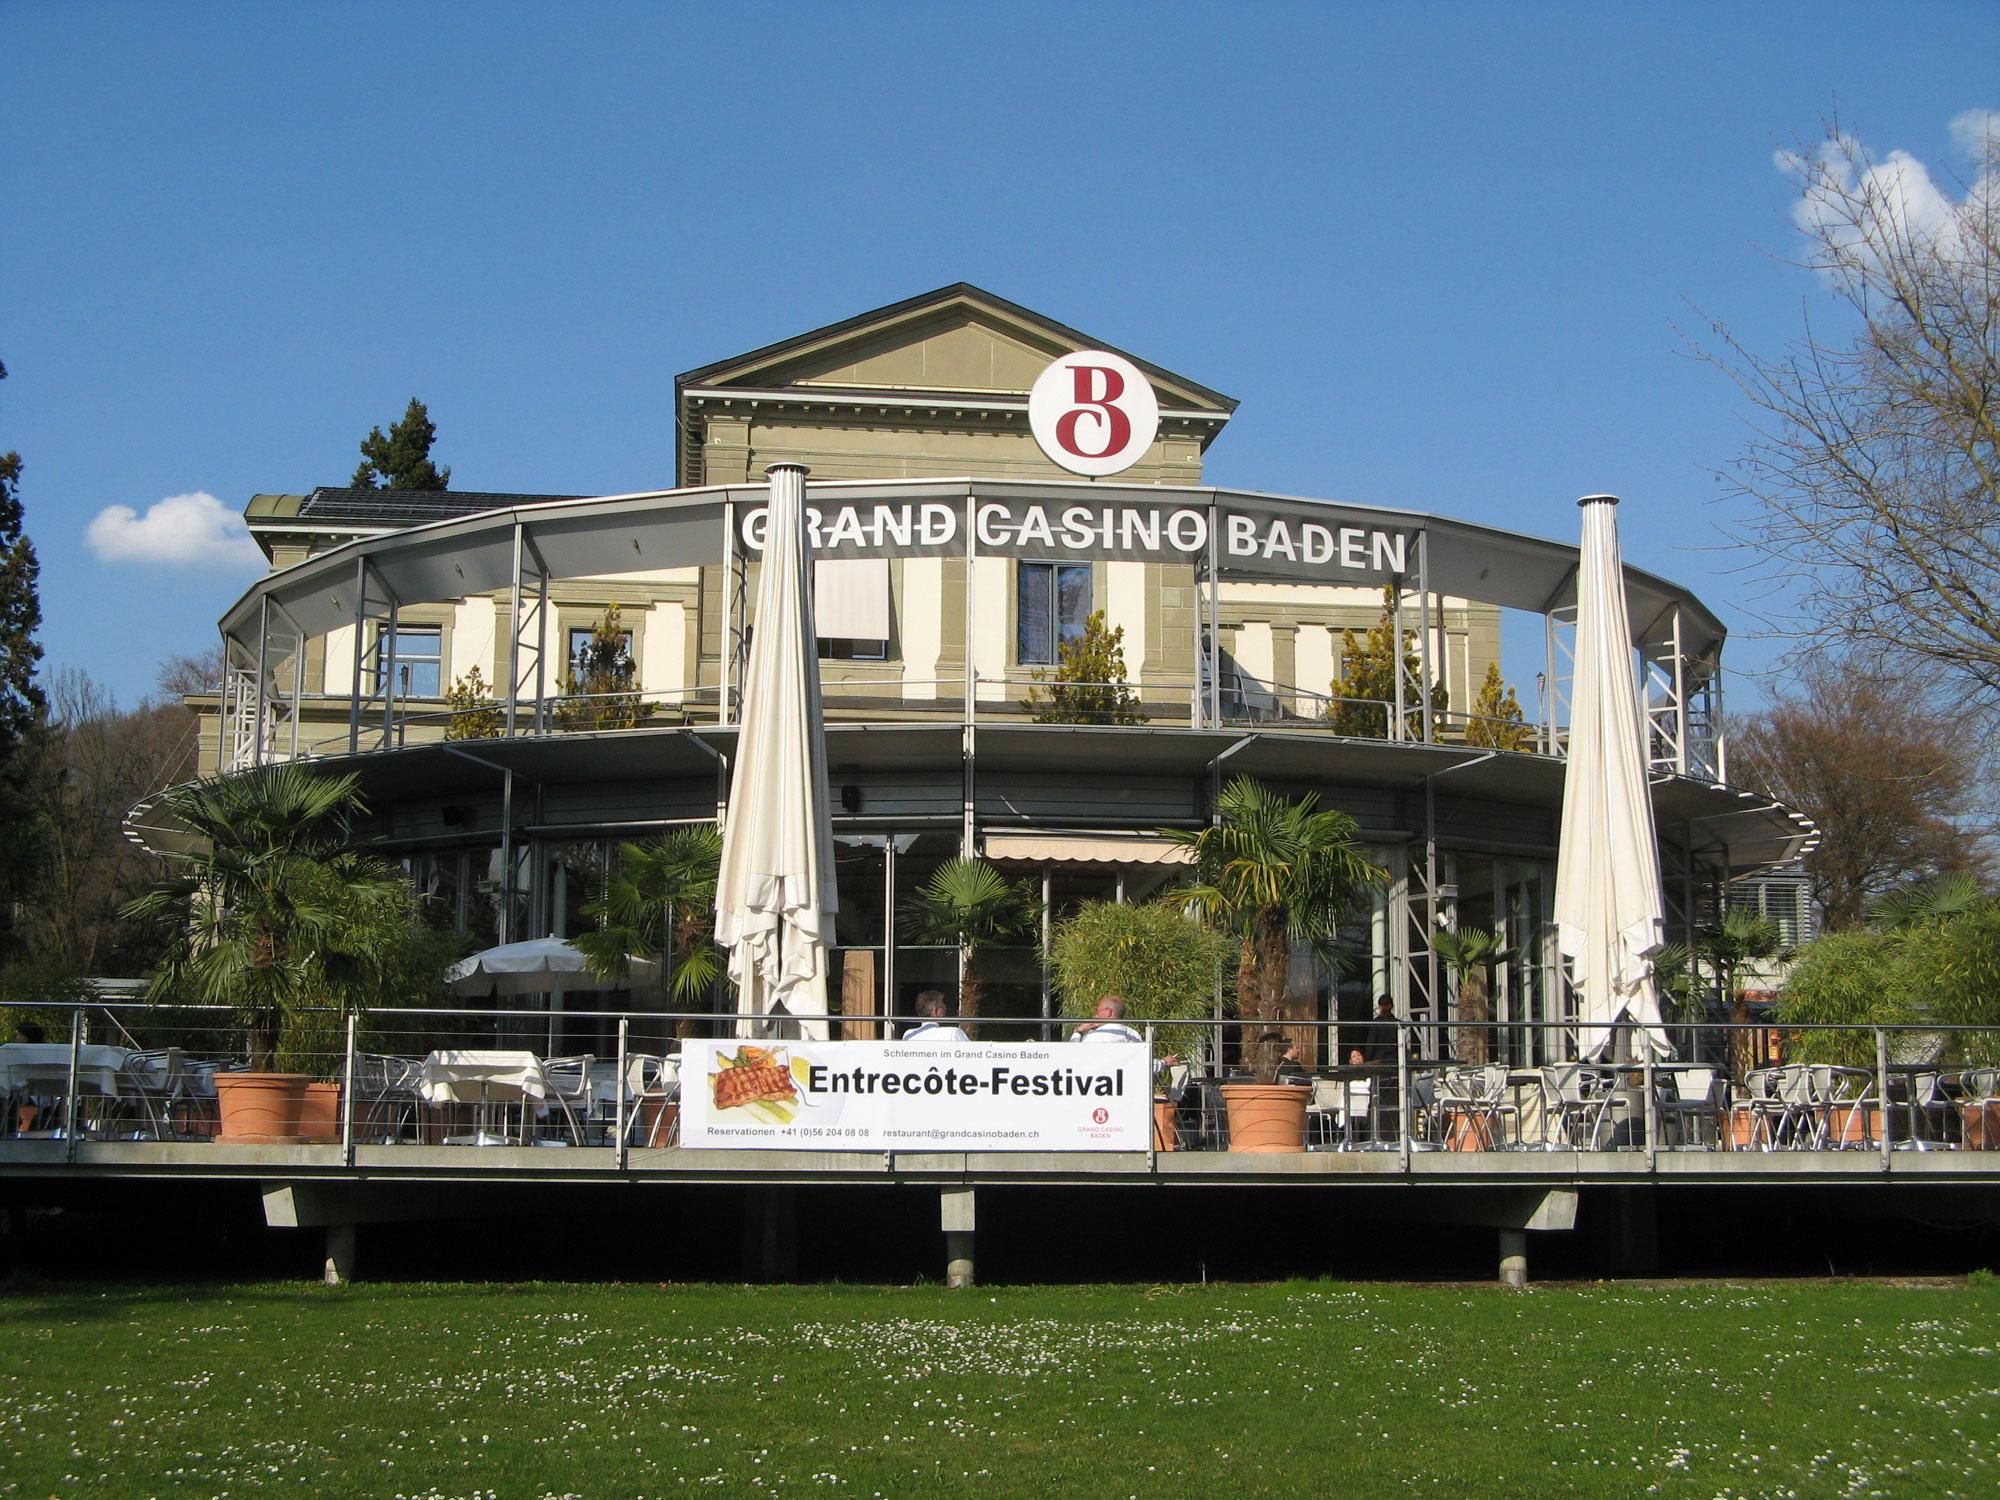 Club Grand Casino Baden